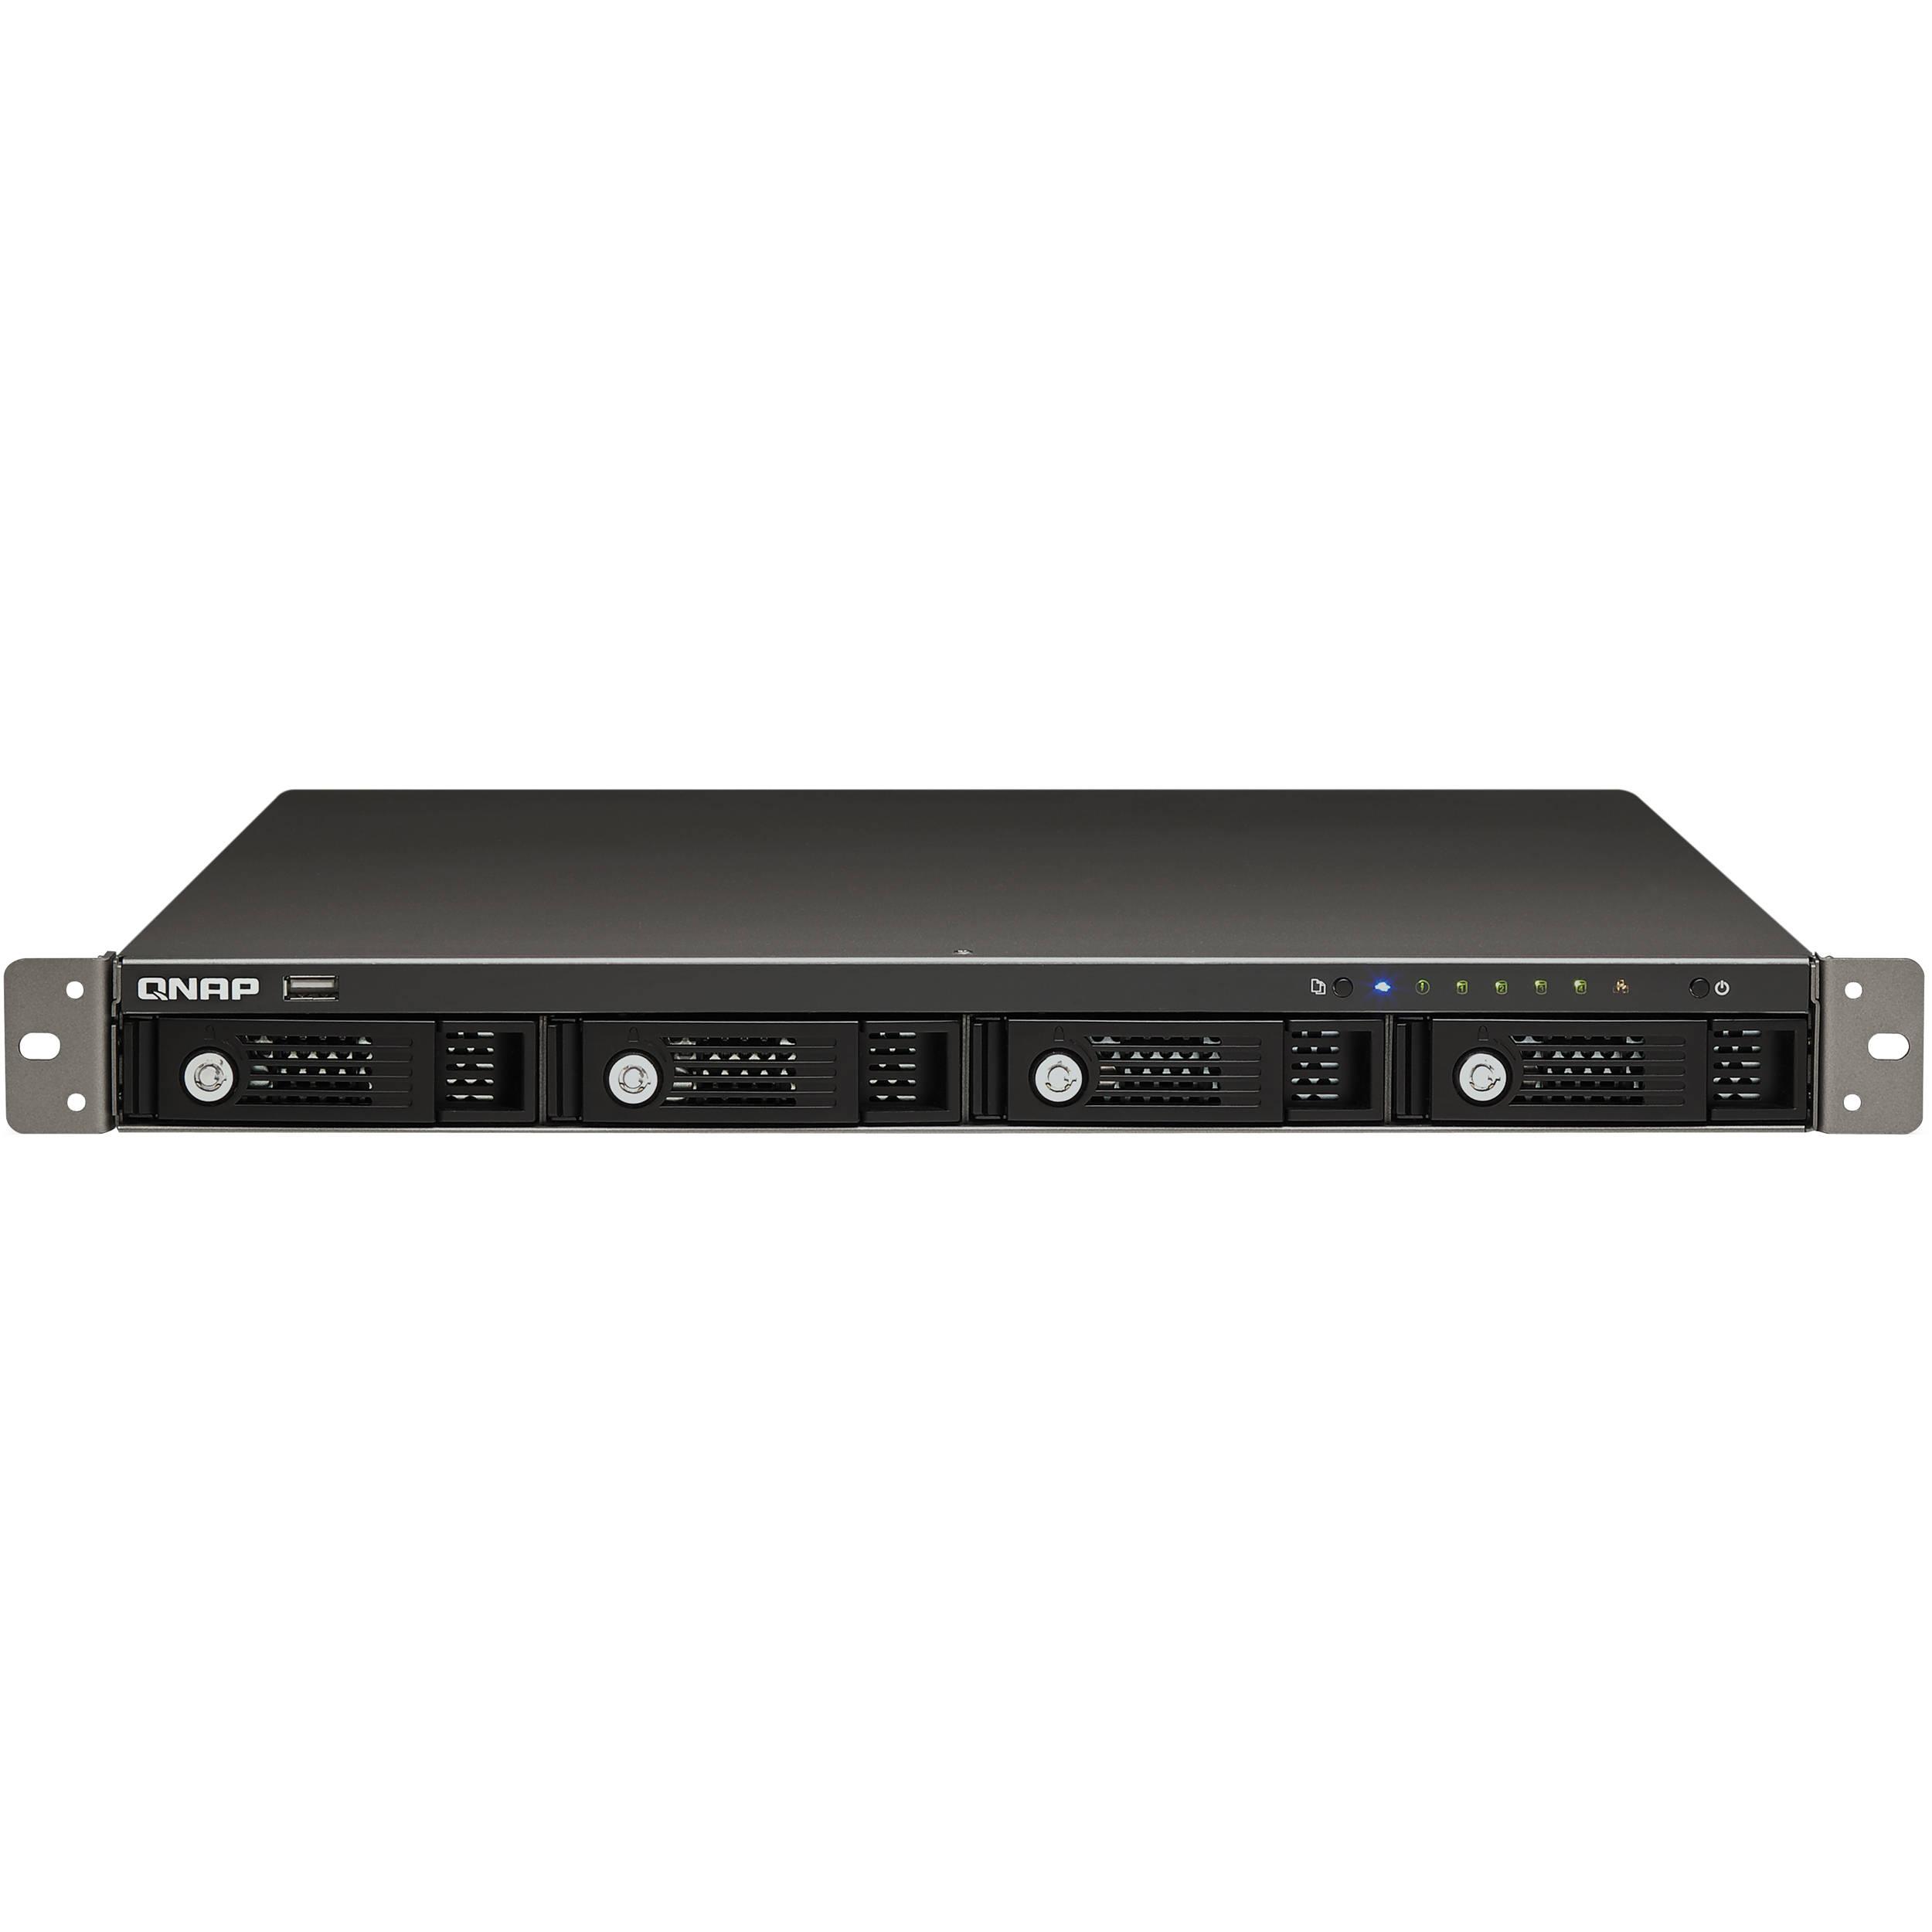 QNAP TS-419U+ All-in-One Turbo NAS 1U Rackmount Server